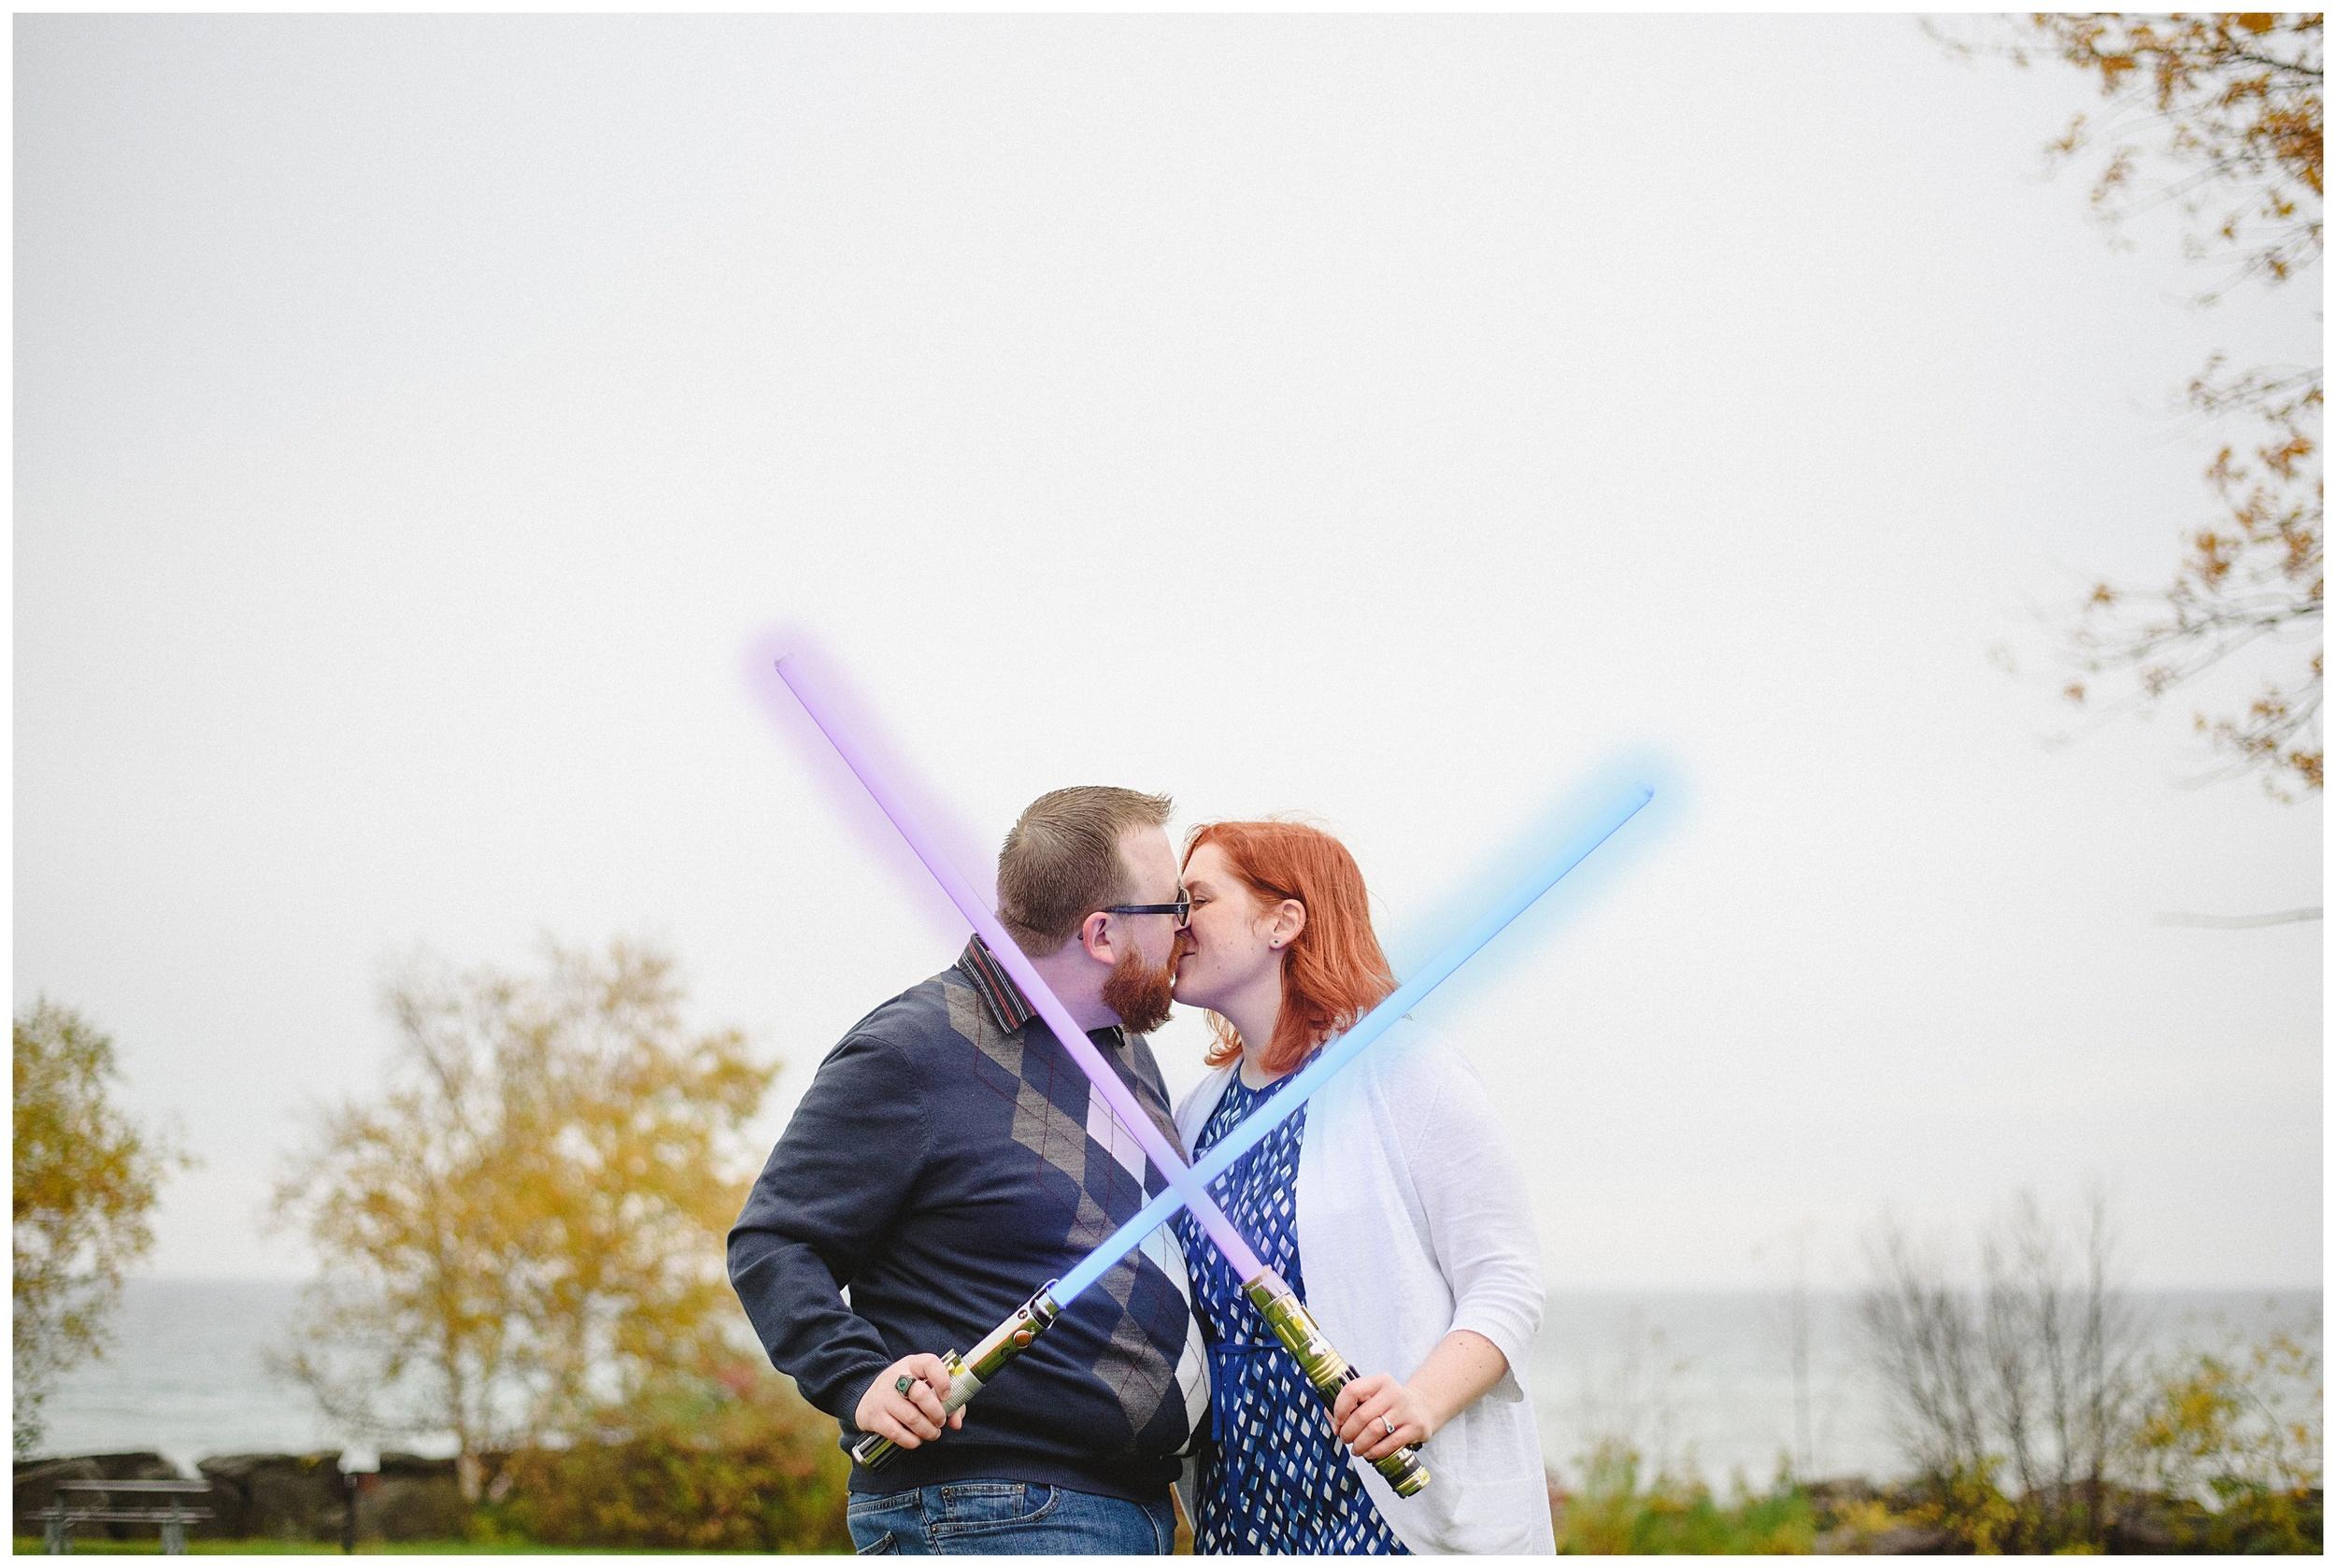 Arynn Photography, Scarborough Bluffs engagement shoot, Toronto Weddding Photographer, Durham Wedding Photographer, Geeky Engagement, lightsaber engagement